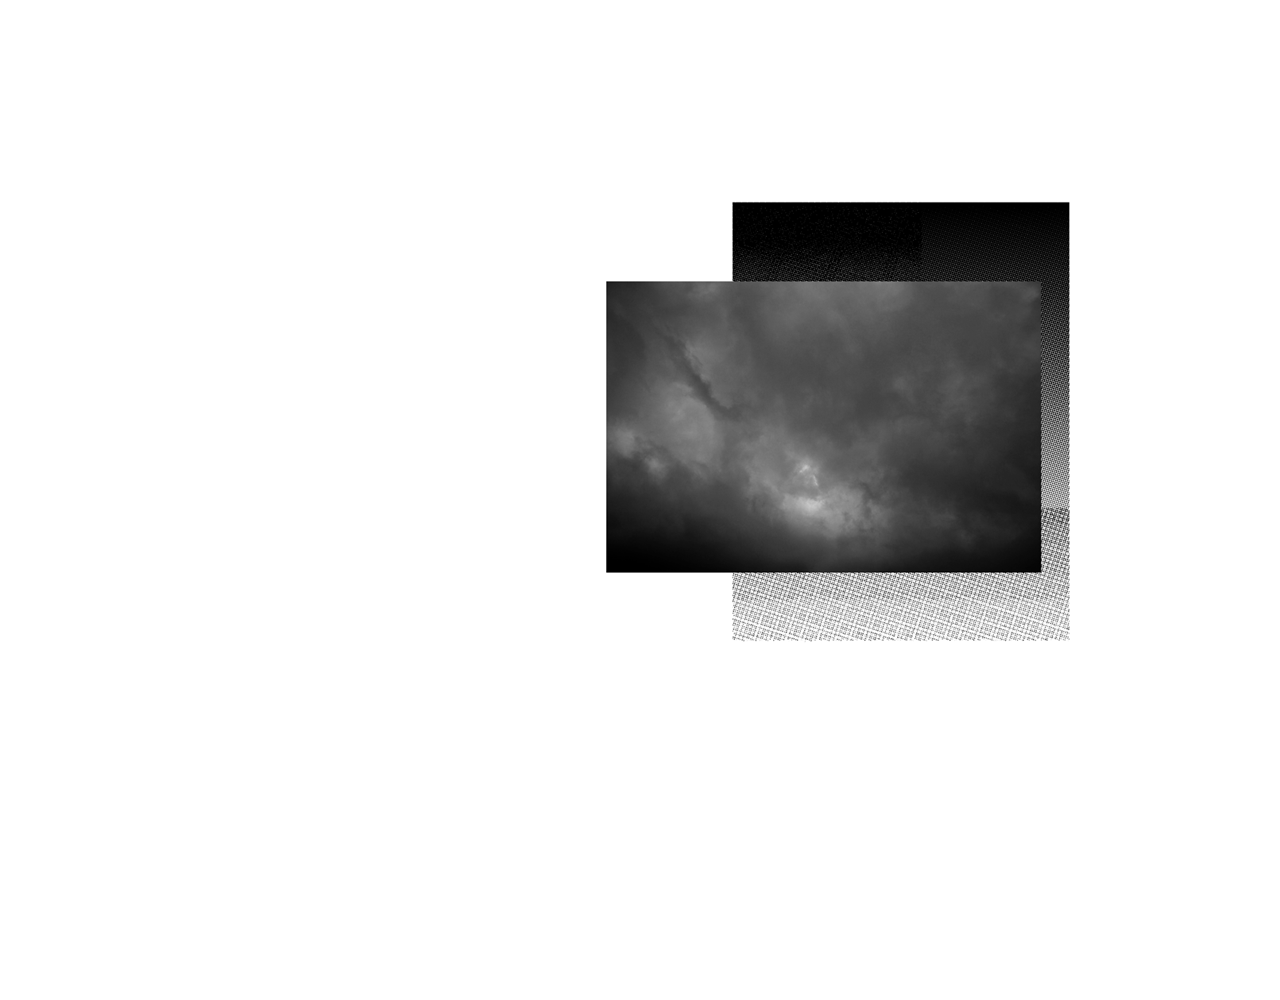 clvstr-senior-anx-3.png